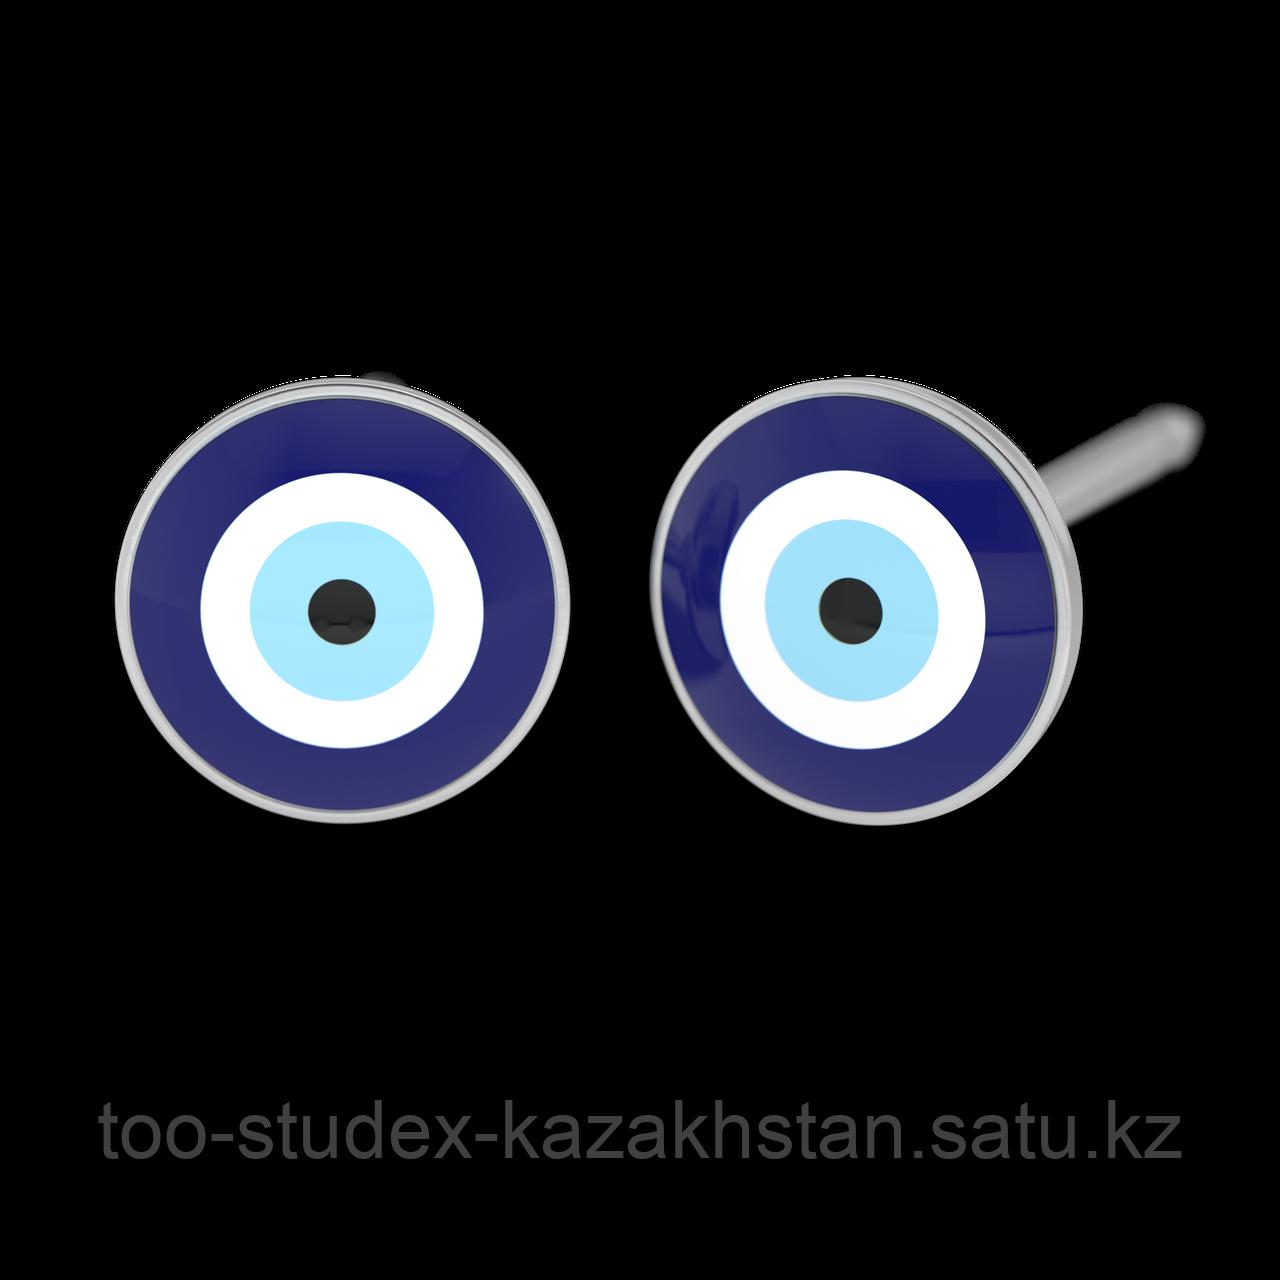 "7512-0668 Серьги для прокола STUDEX System75 ""Назар"" - фото 1"